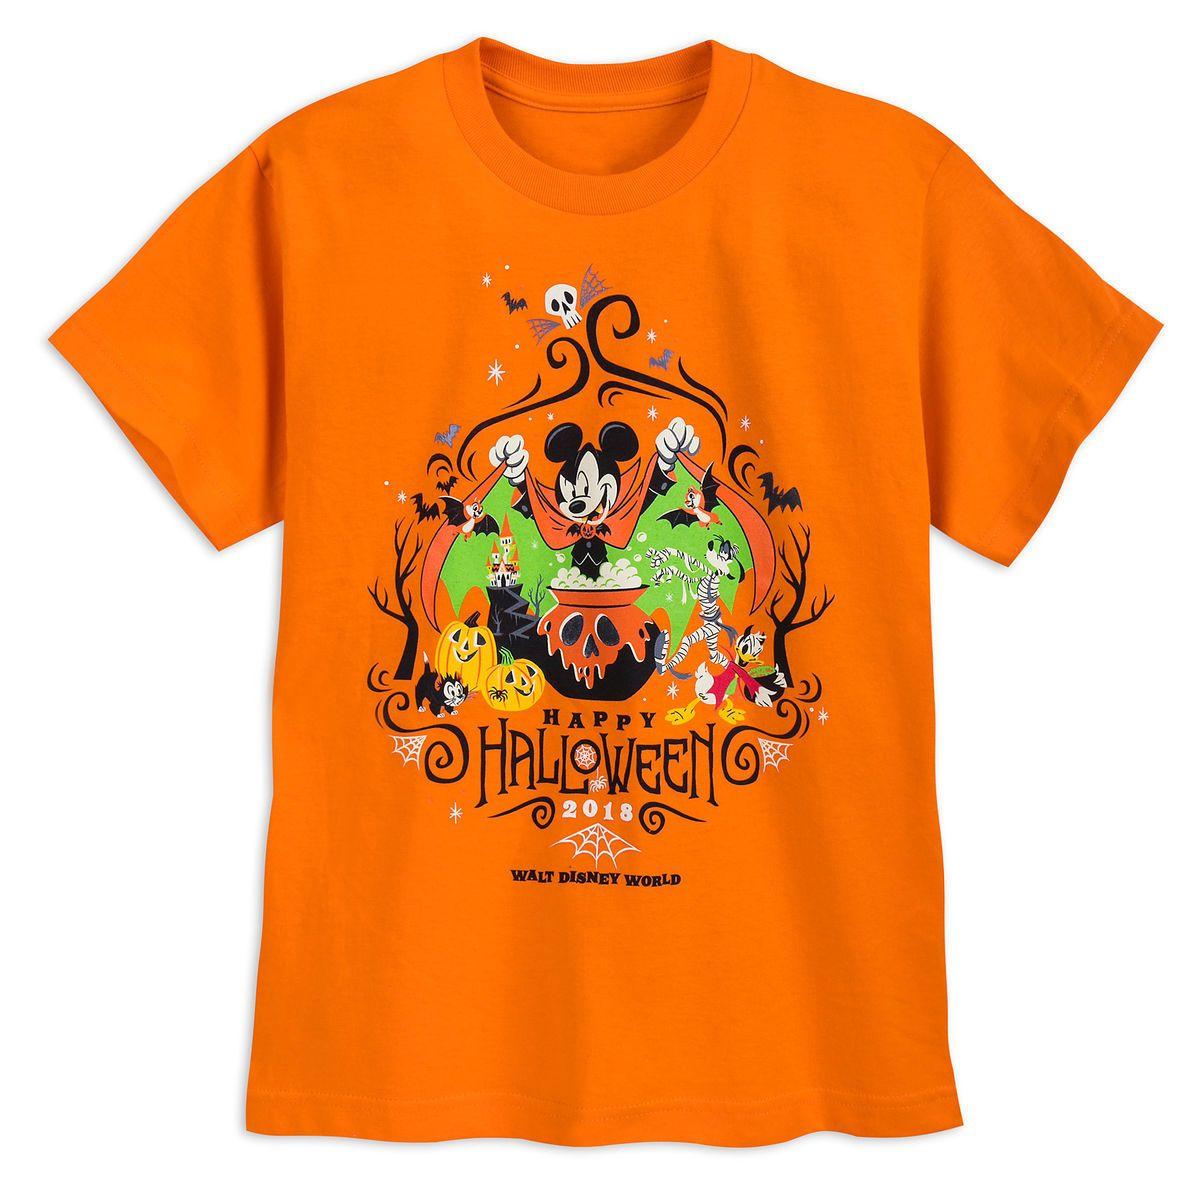 Walt Disney World Halloween T Shirts.Mickey Mouse And Friends Halloween T Shirt For Kids Walt Disney